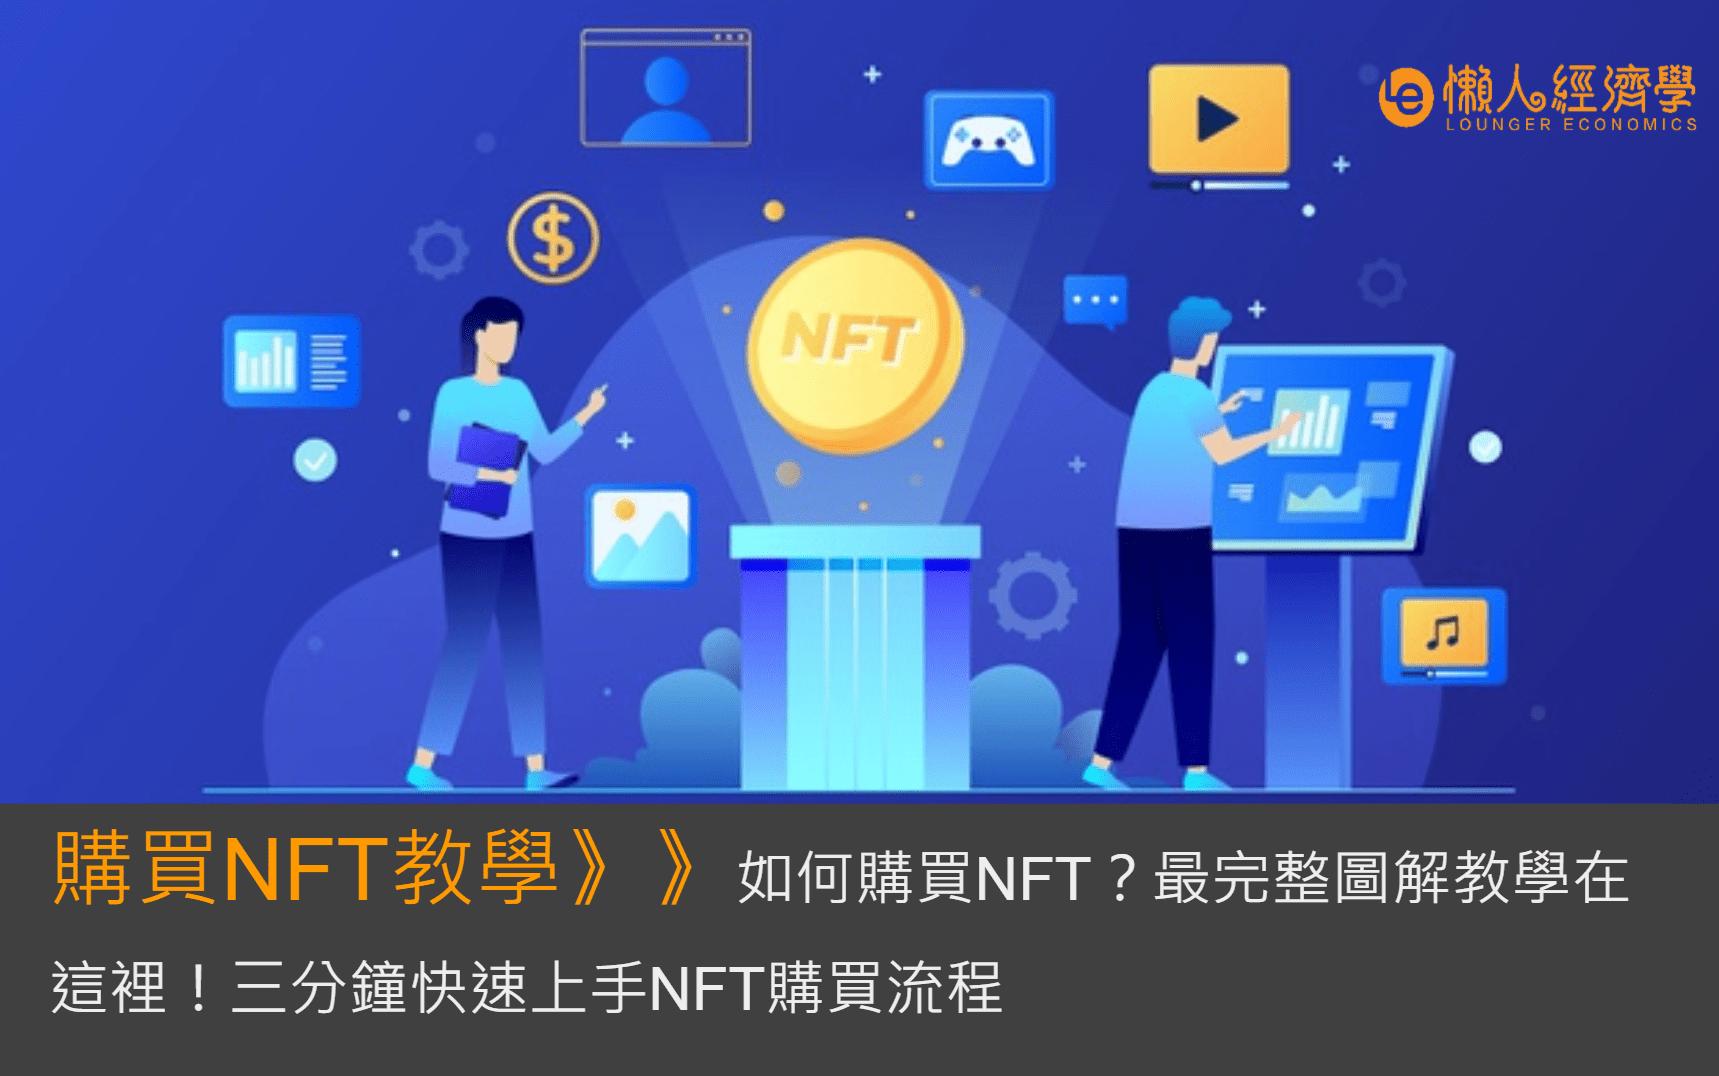 NFT平台介紹